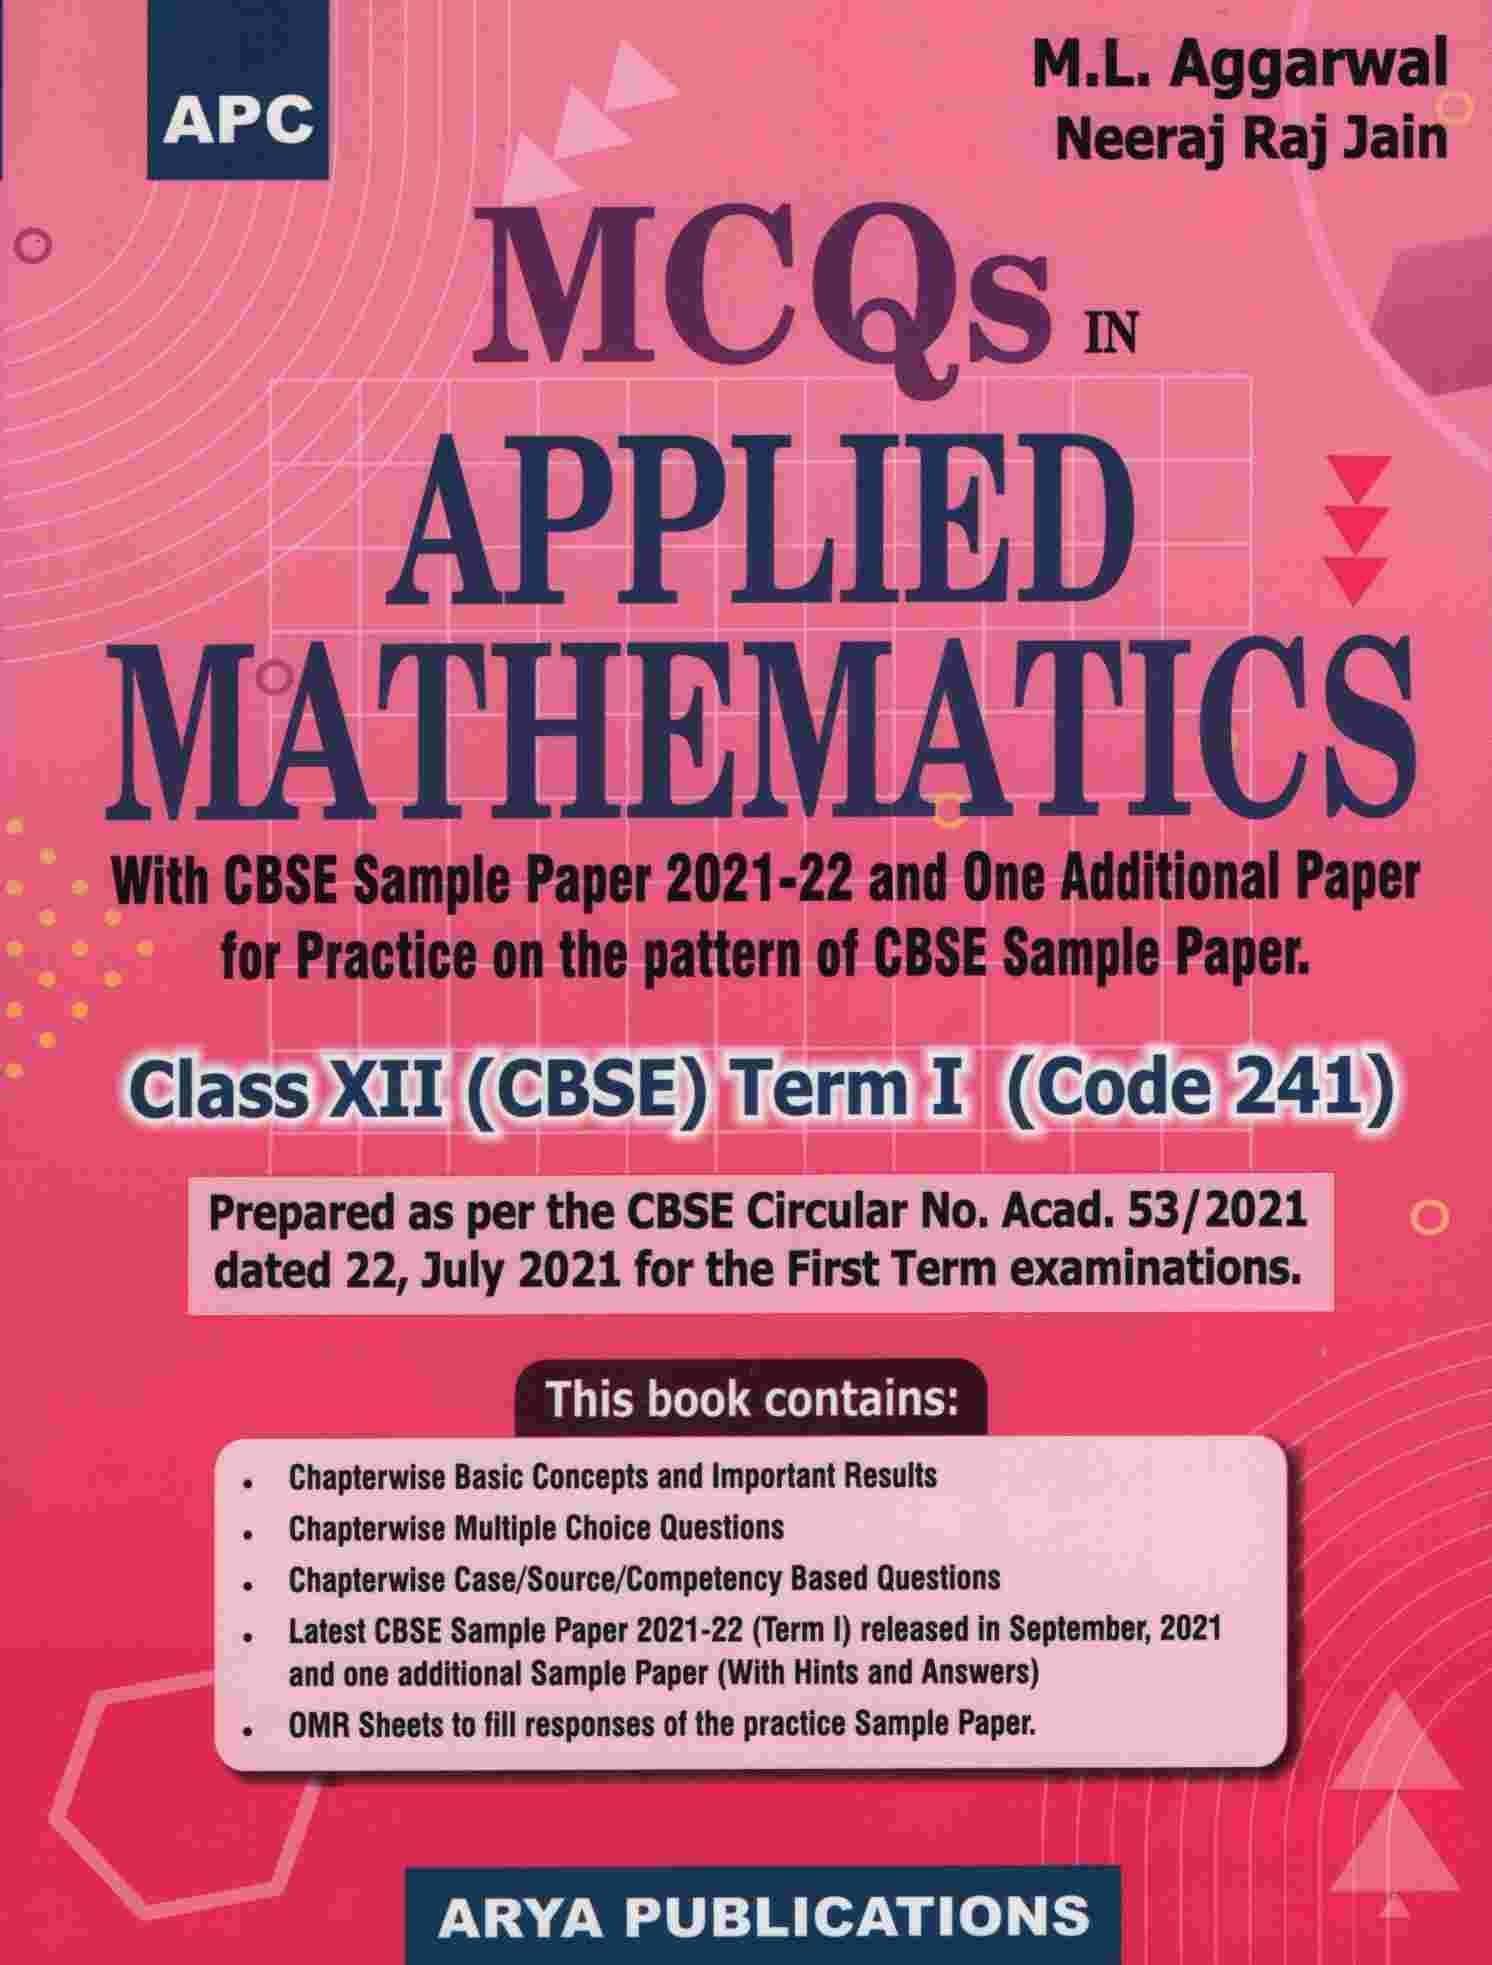 MCQs in Applied Mathematics Class XII (CBSE) Term -I